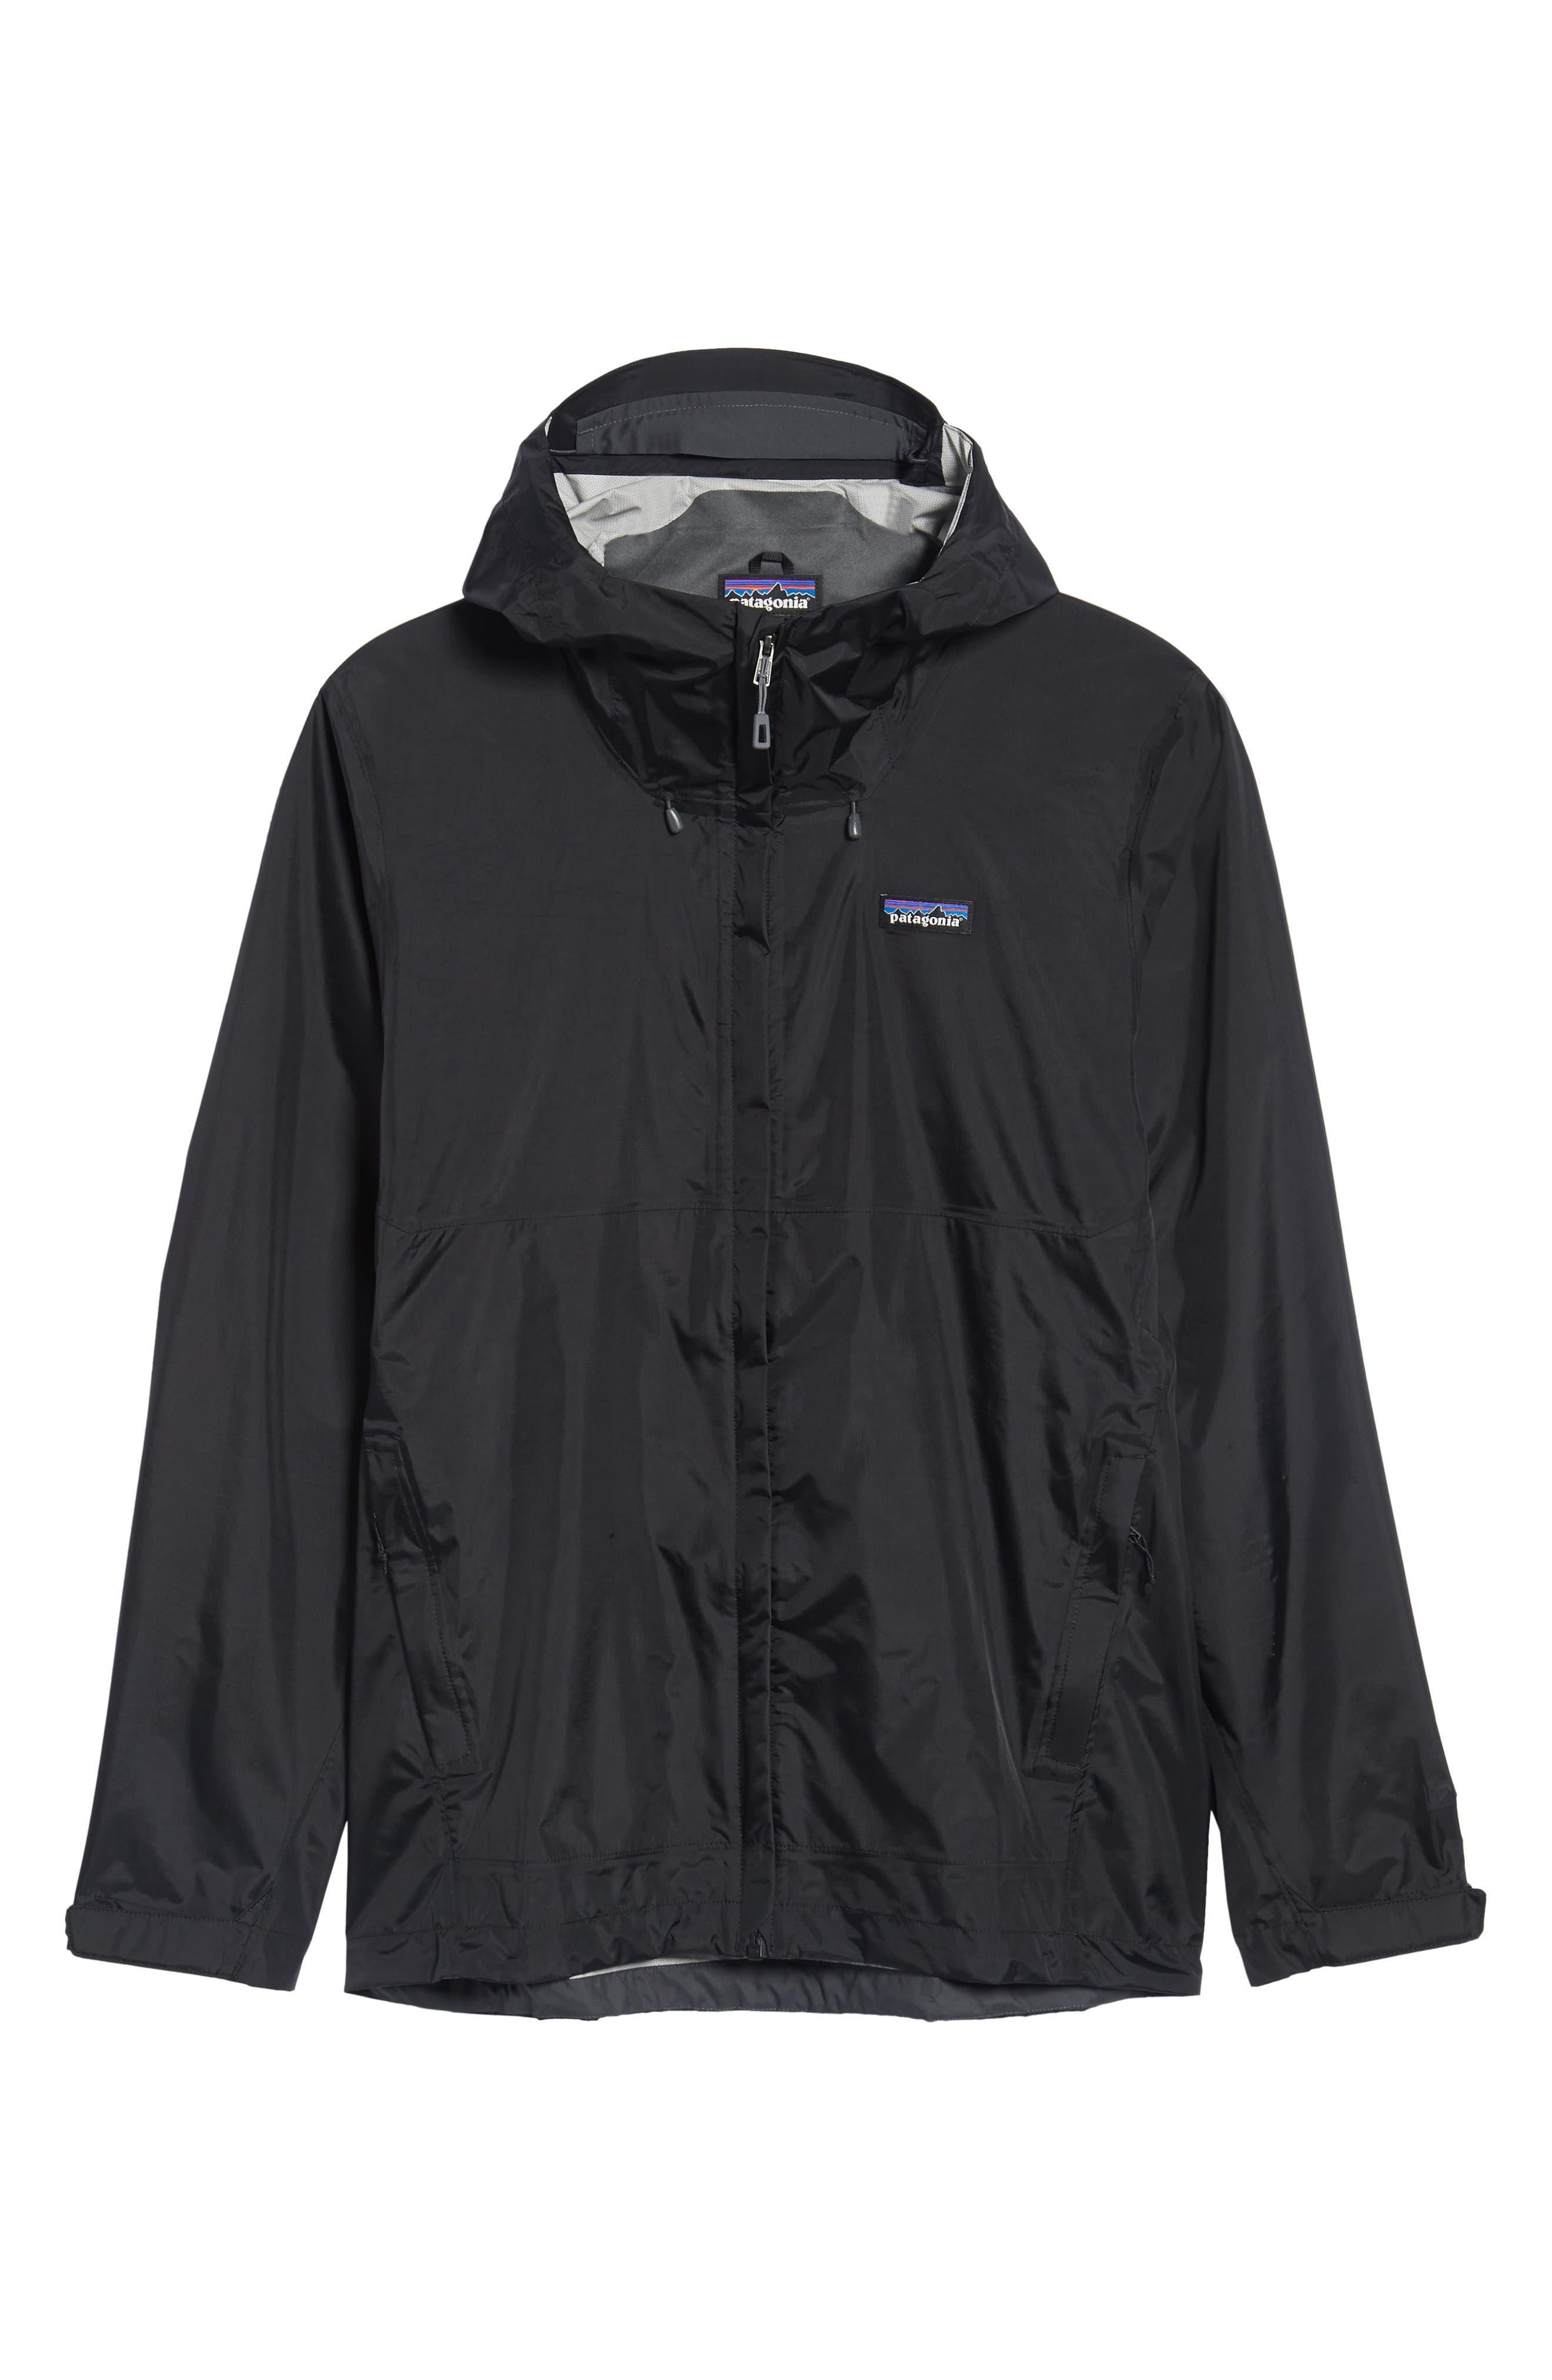 'Torrentshell' Packable Rain Jacket,                             Main thumbnail 1, color,                             Black